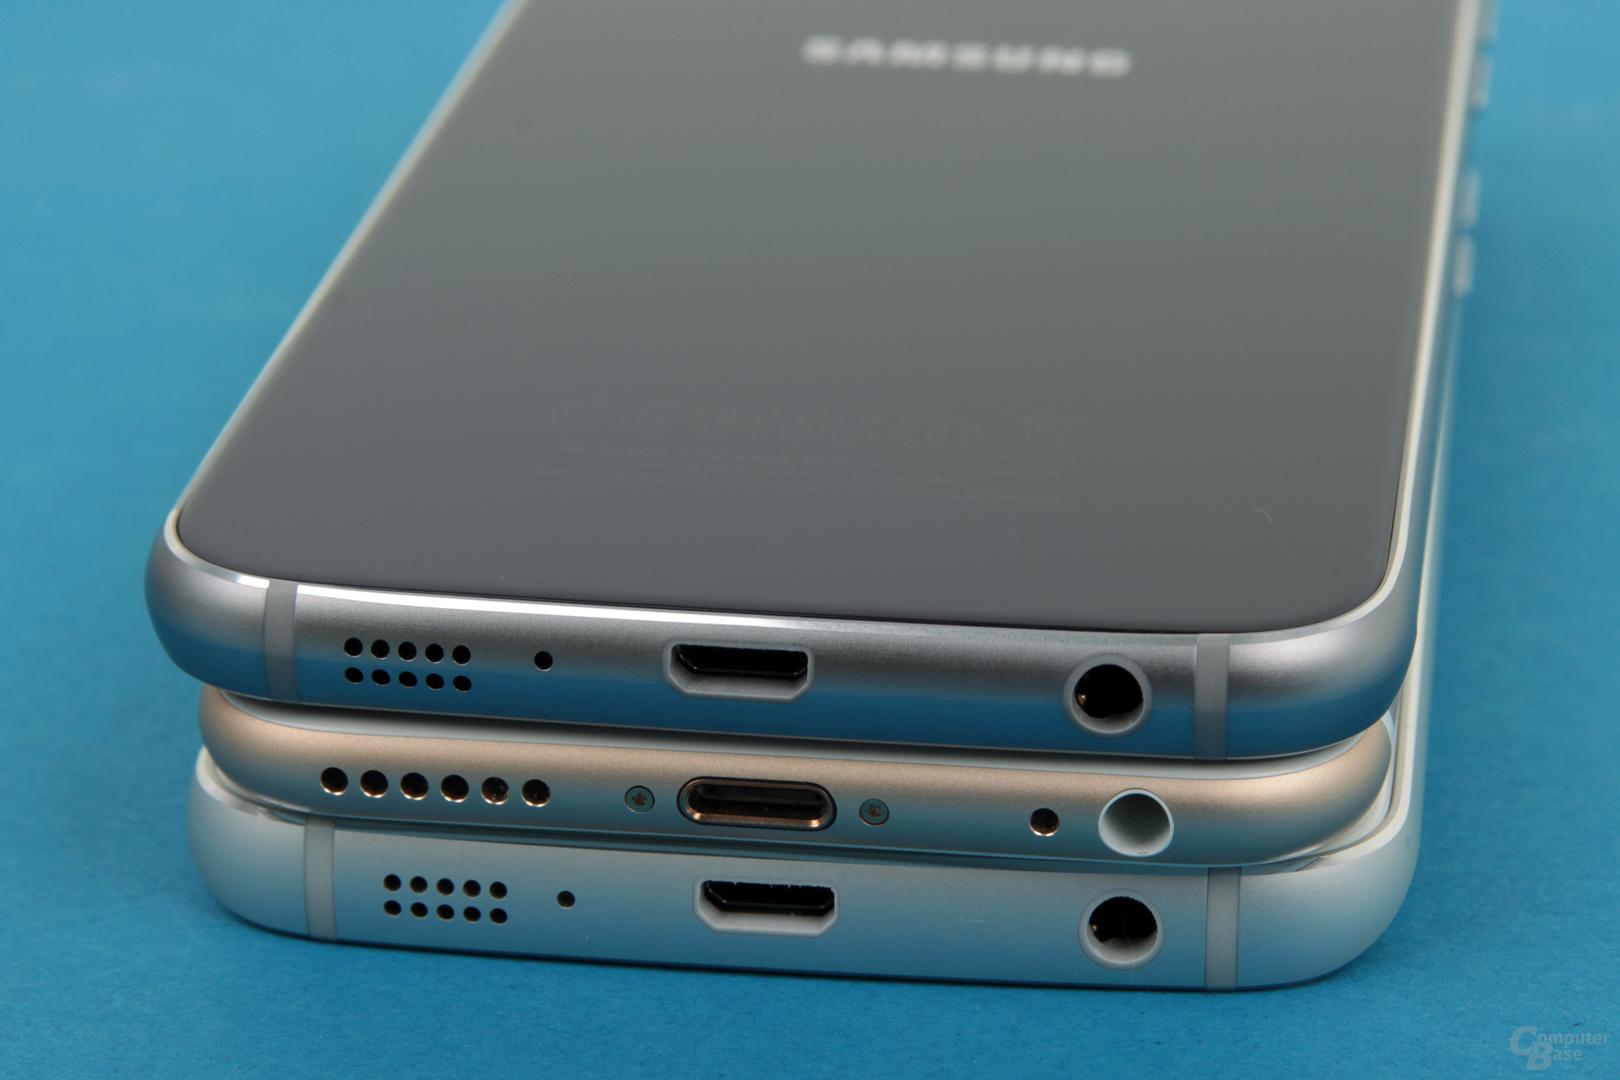 Galaxy S6 – iPhone 6 – Galaxy S6 edge